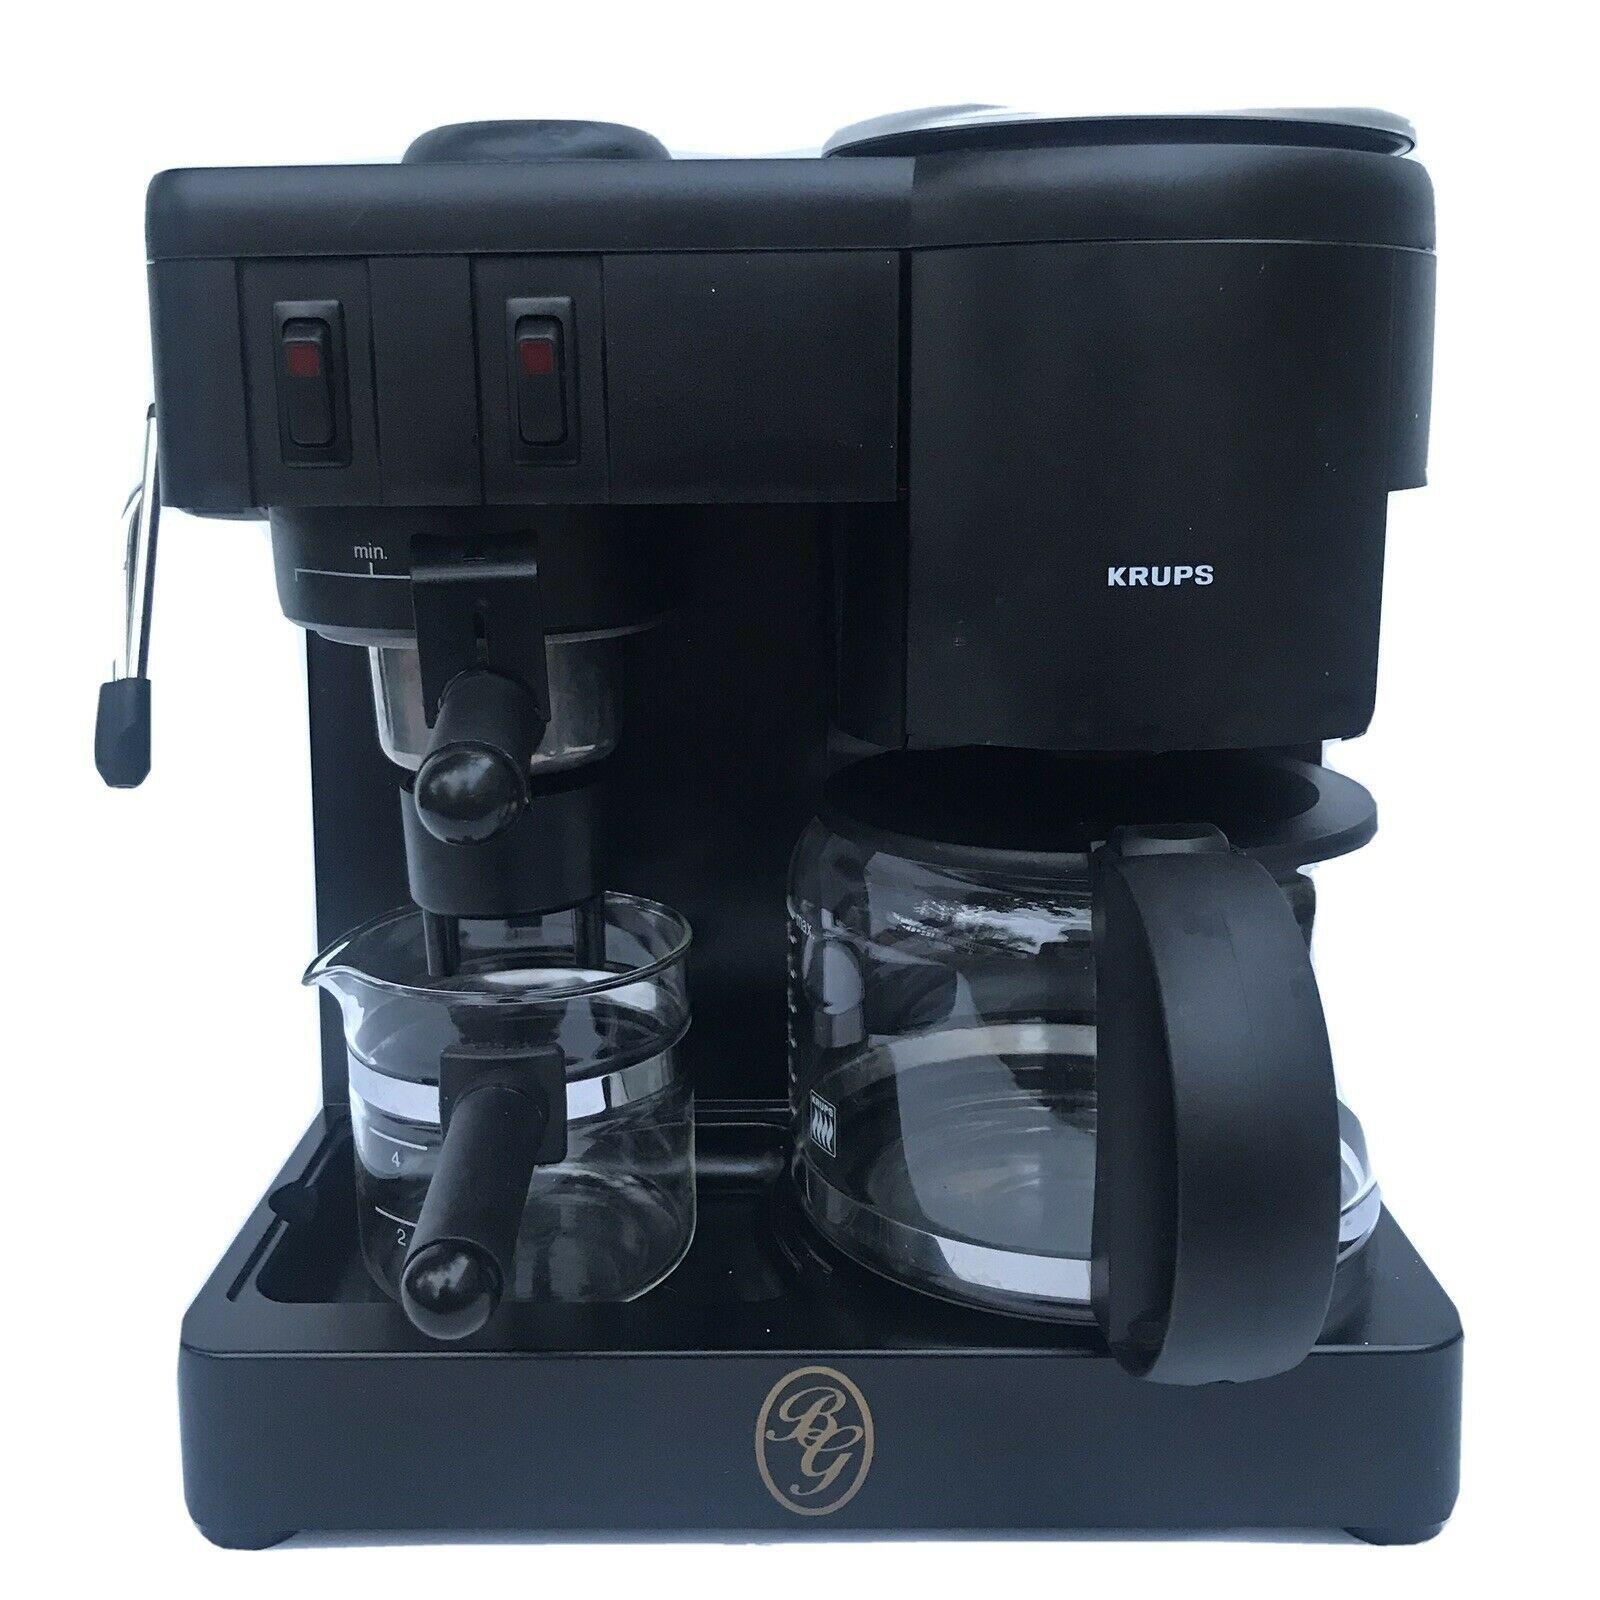 Krups 171 Cafepresso Black 8 Cups Drip Coffee Espresso Machine Tested Works Ideas Of Espresso Machine Espressomachine Espresso Machine Espresso Krups